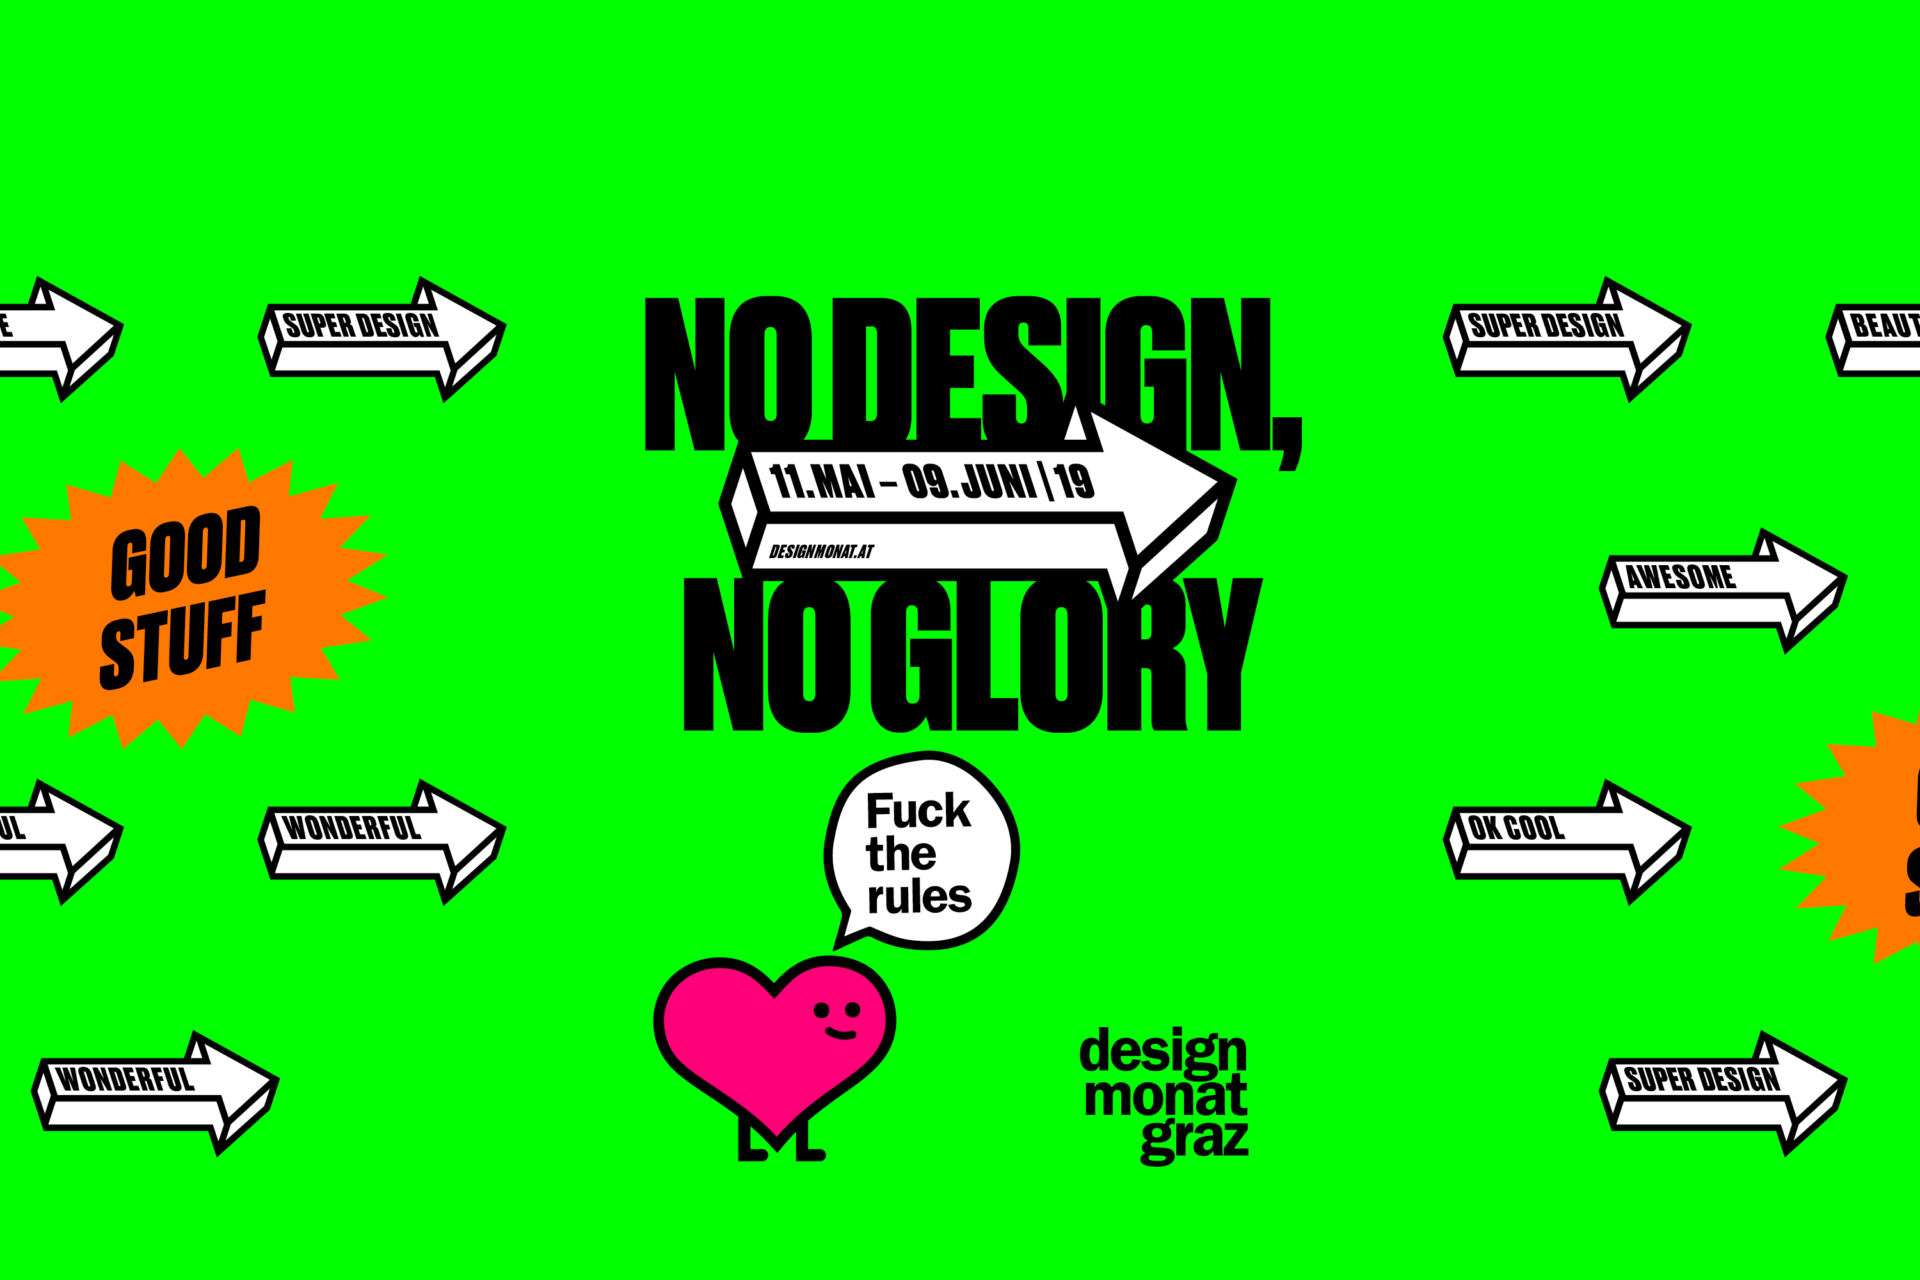 No Design, no Glory als Motto für den DMG19